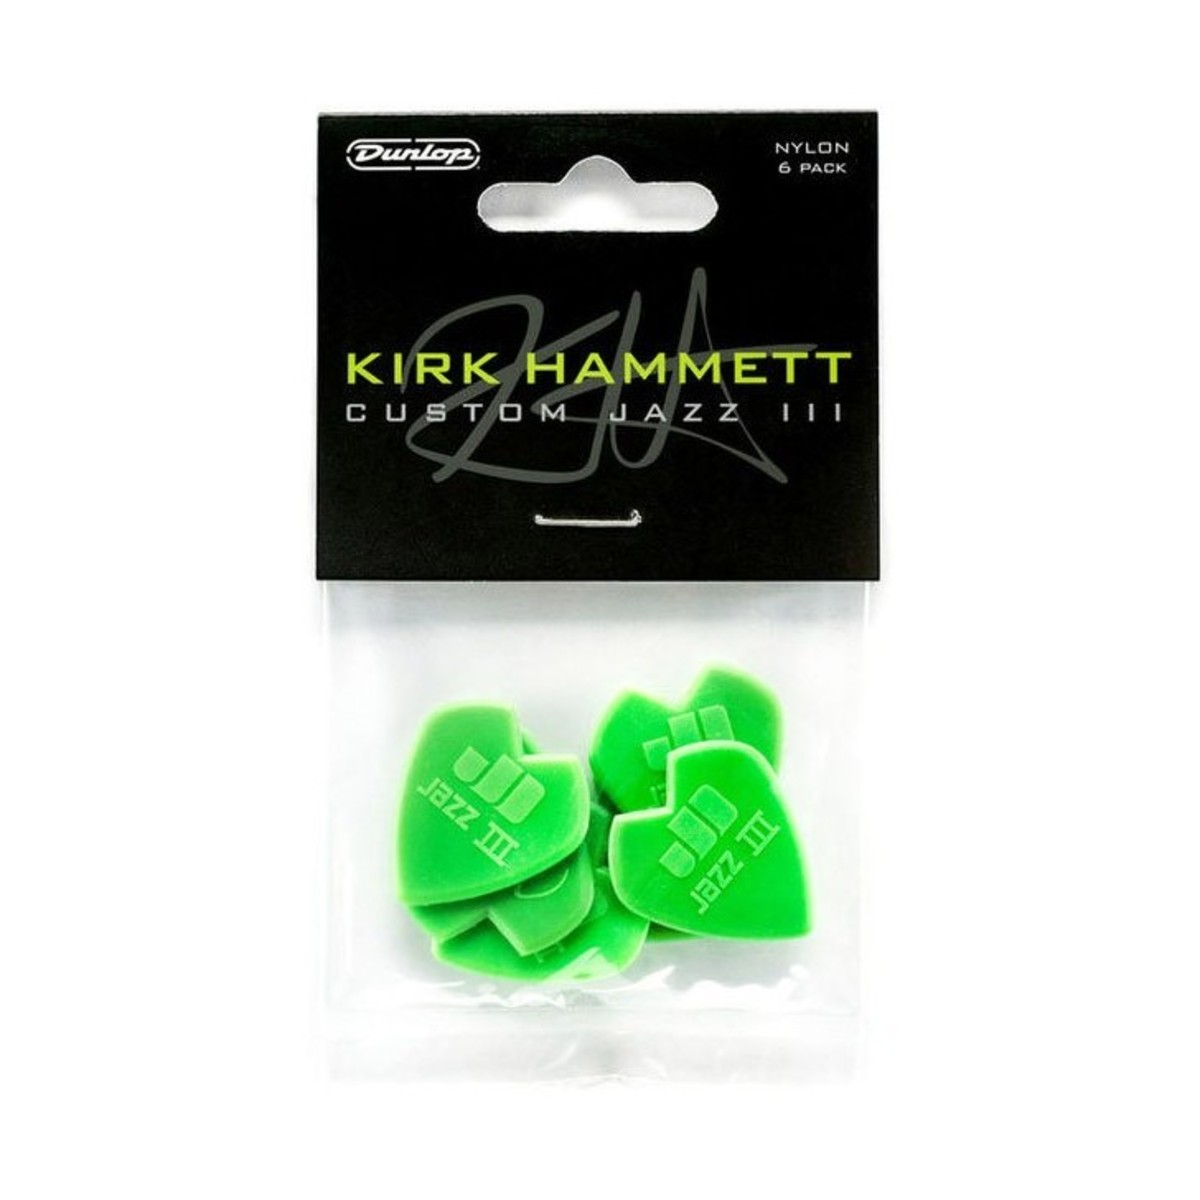 Image of Dunlop Kirk Hammett Custom Jazz III Picks Pack of 6